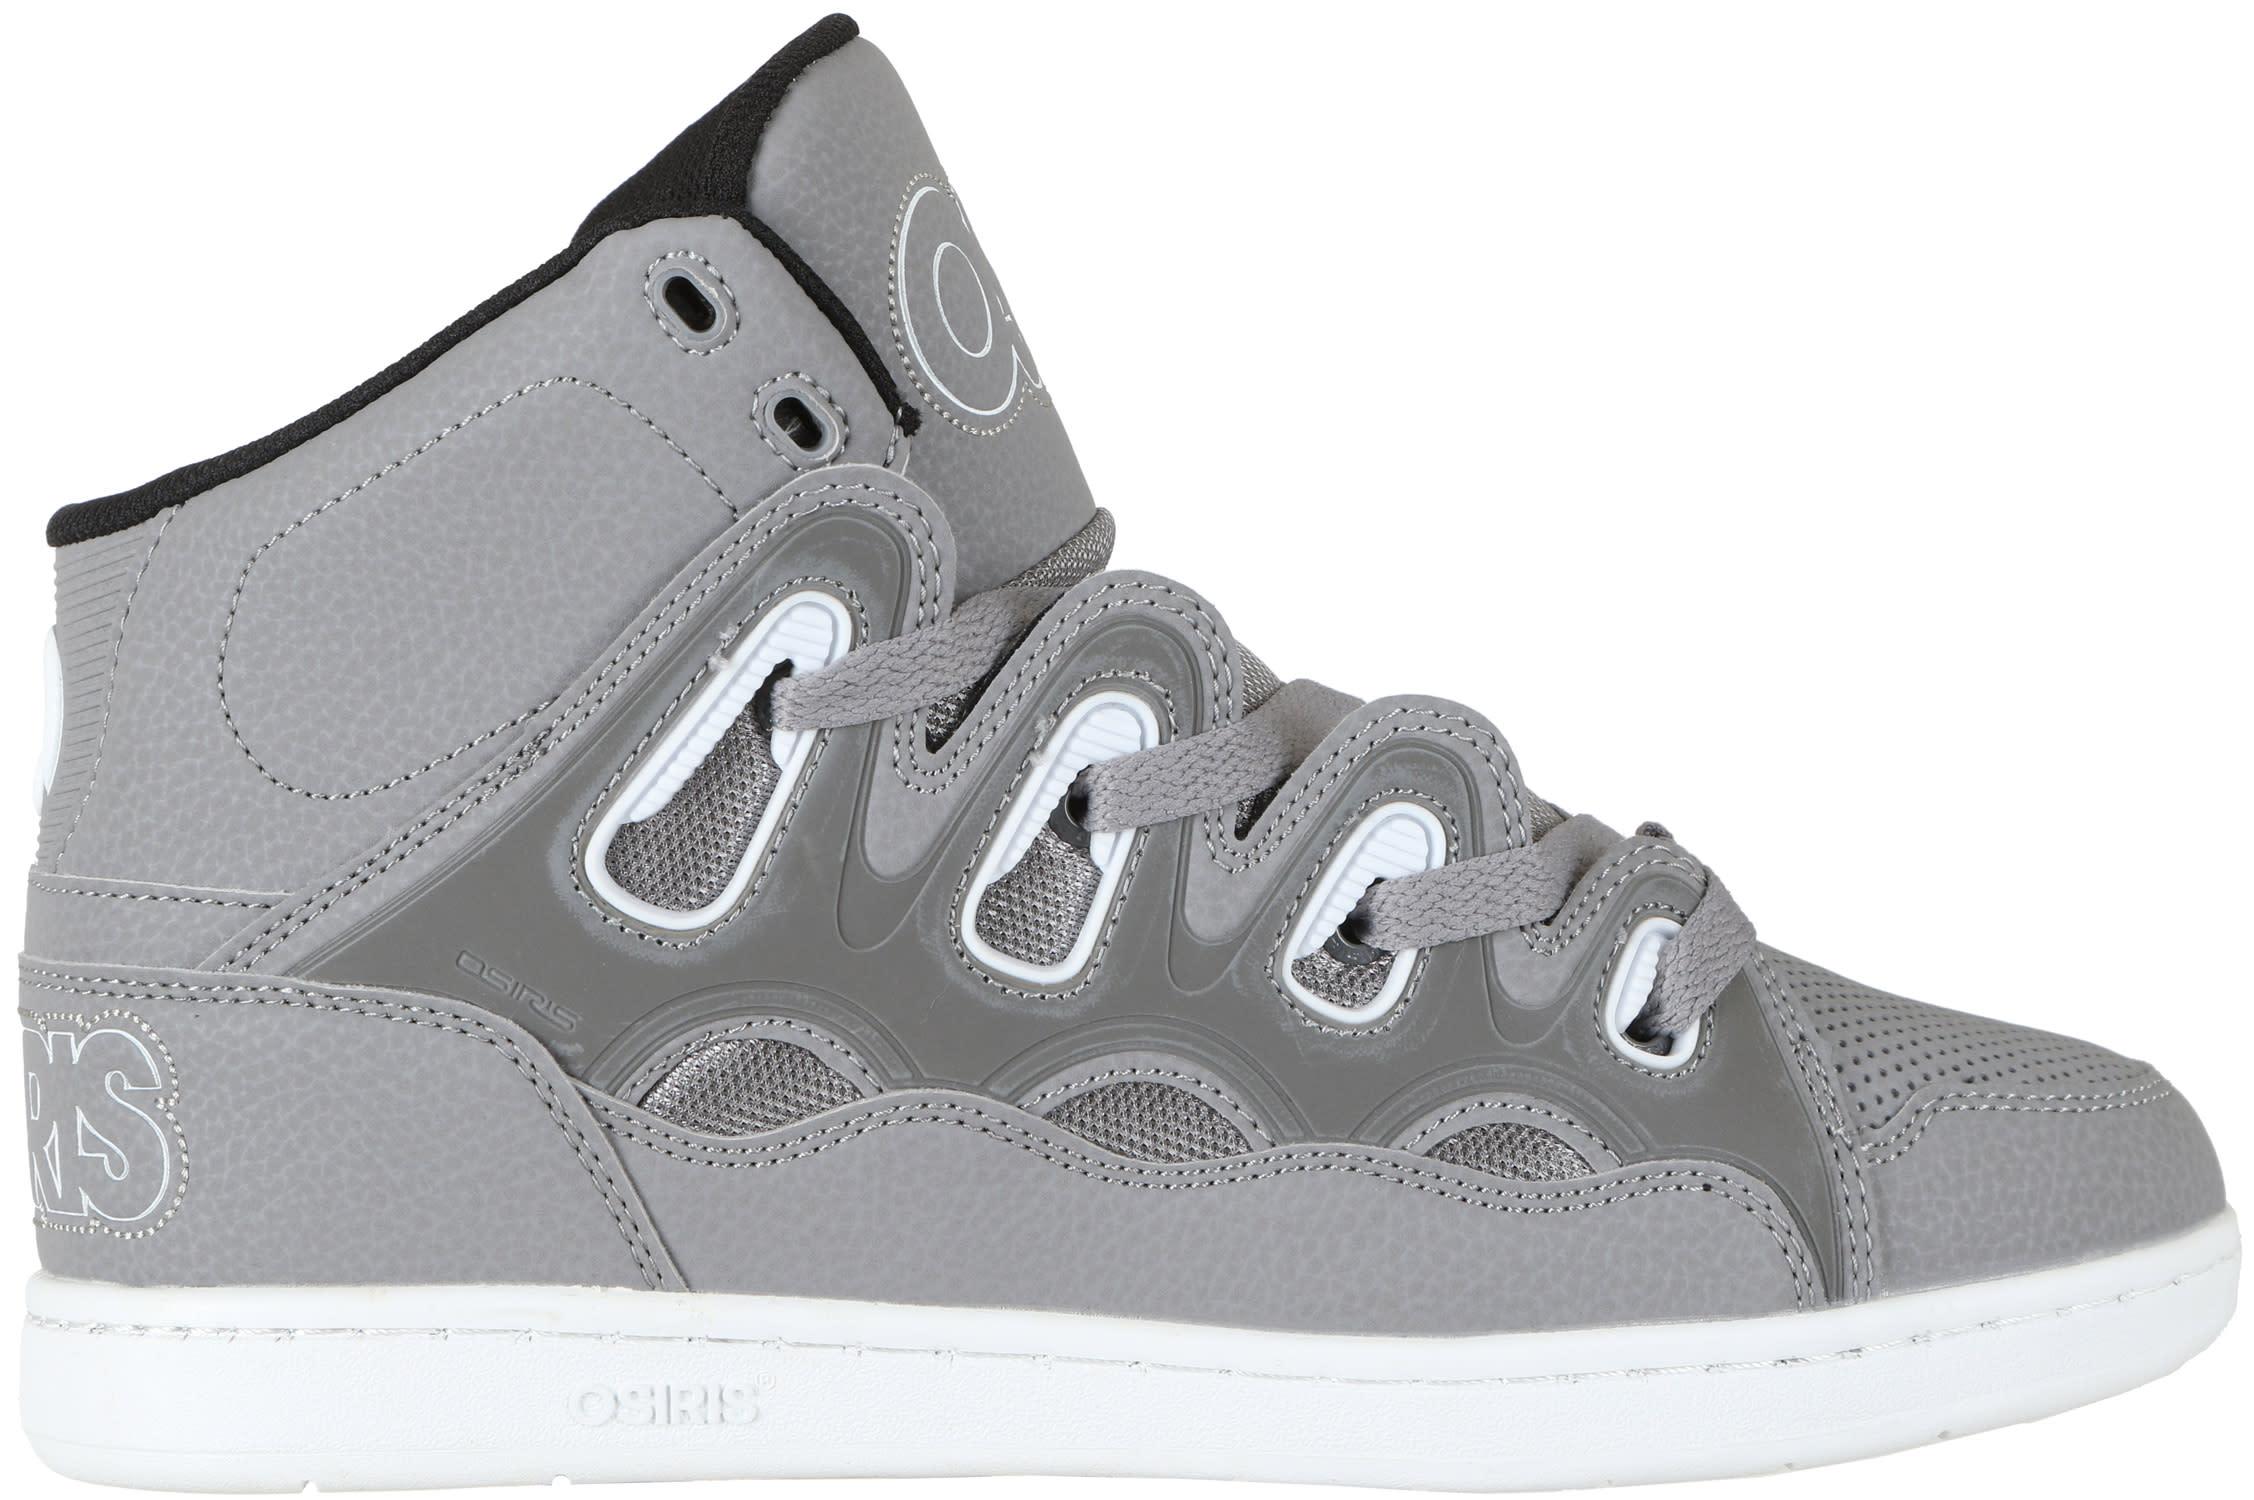 Osiris D3H Skate Shoes